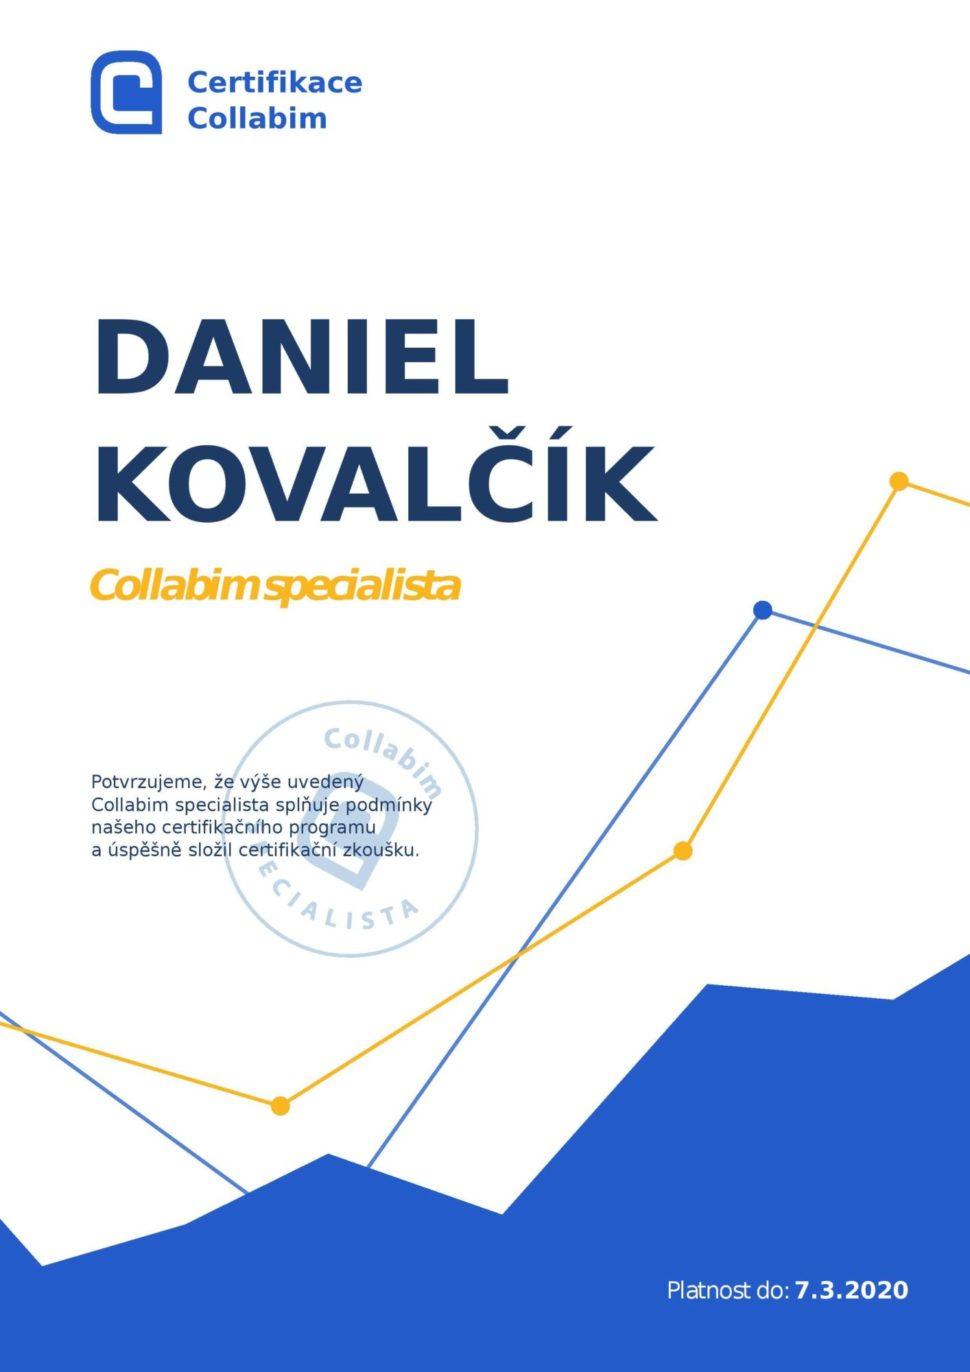 Collabim Specialista Daniel Kovalčík